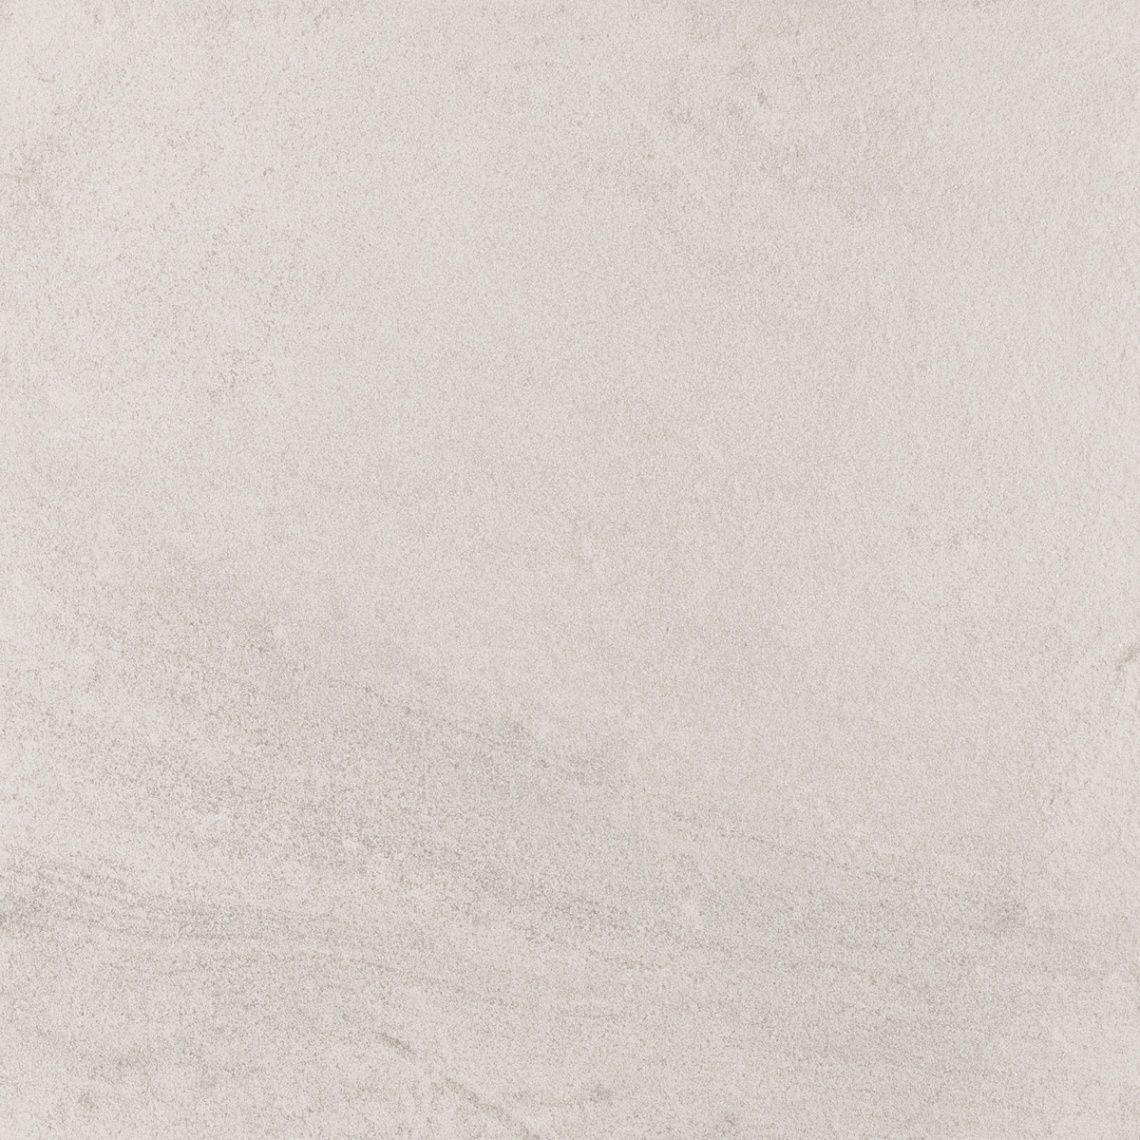 URBATEK. Cerámica todo masa en gres porcelánico técnico: URBATEK Collection - Deep Collection > White